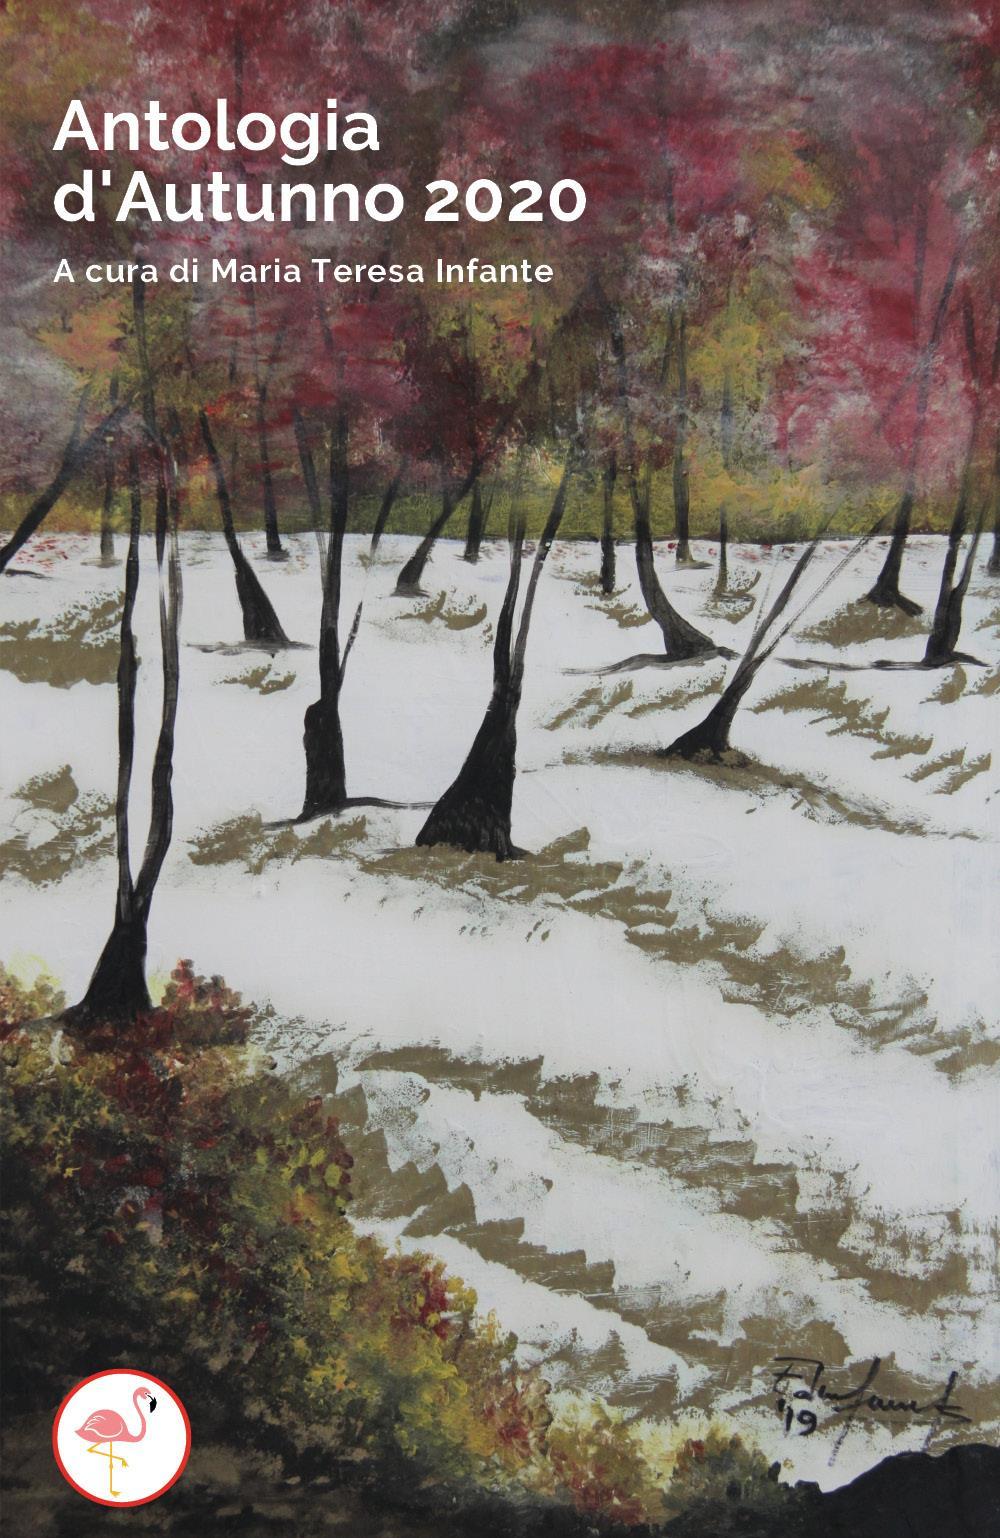 Antologia d'autunno